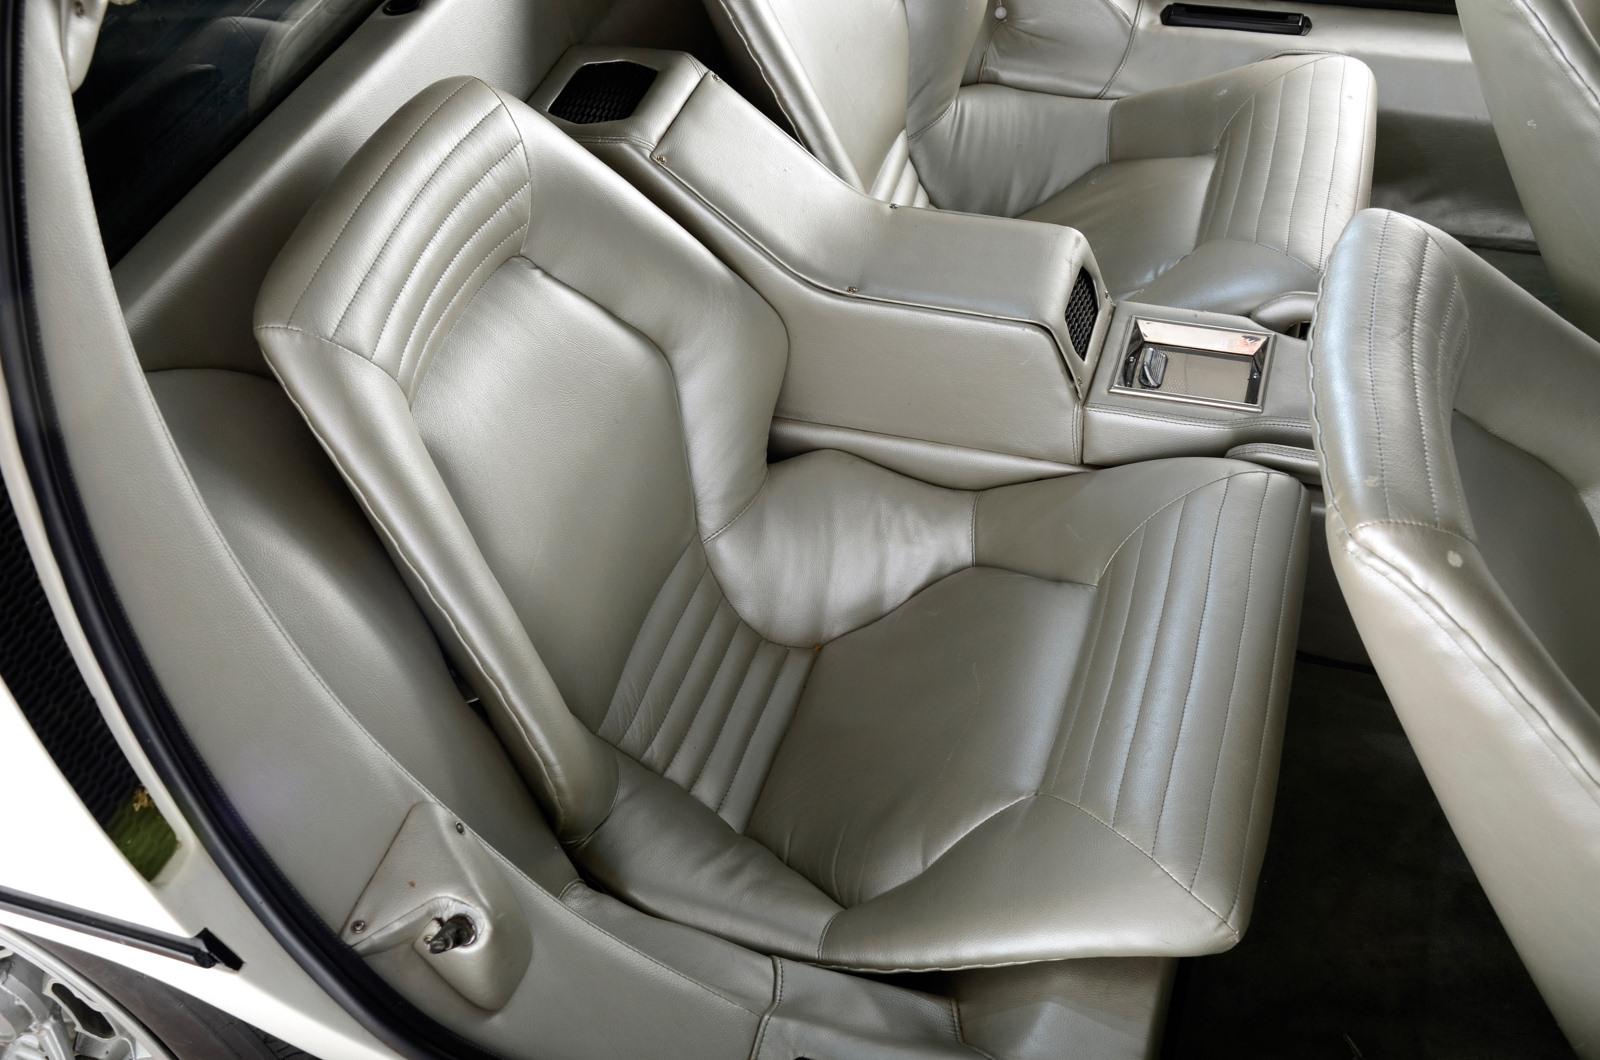 Lamborghini Marzal Concept by Bertone